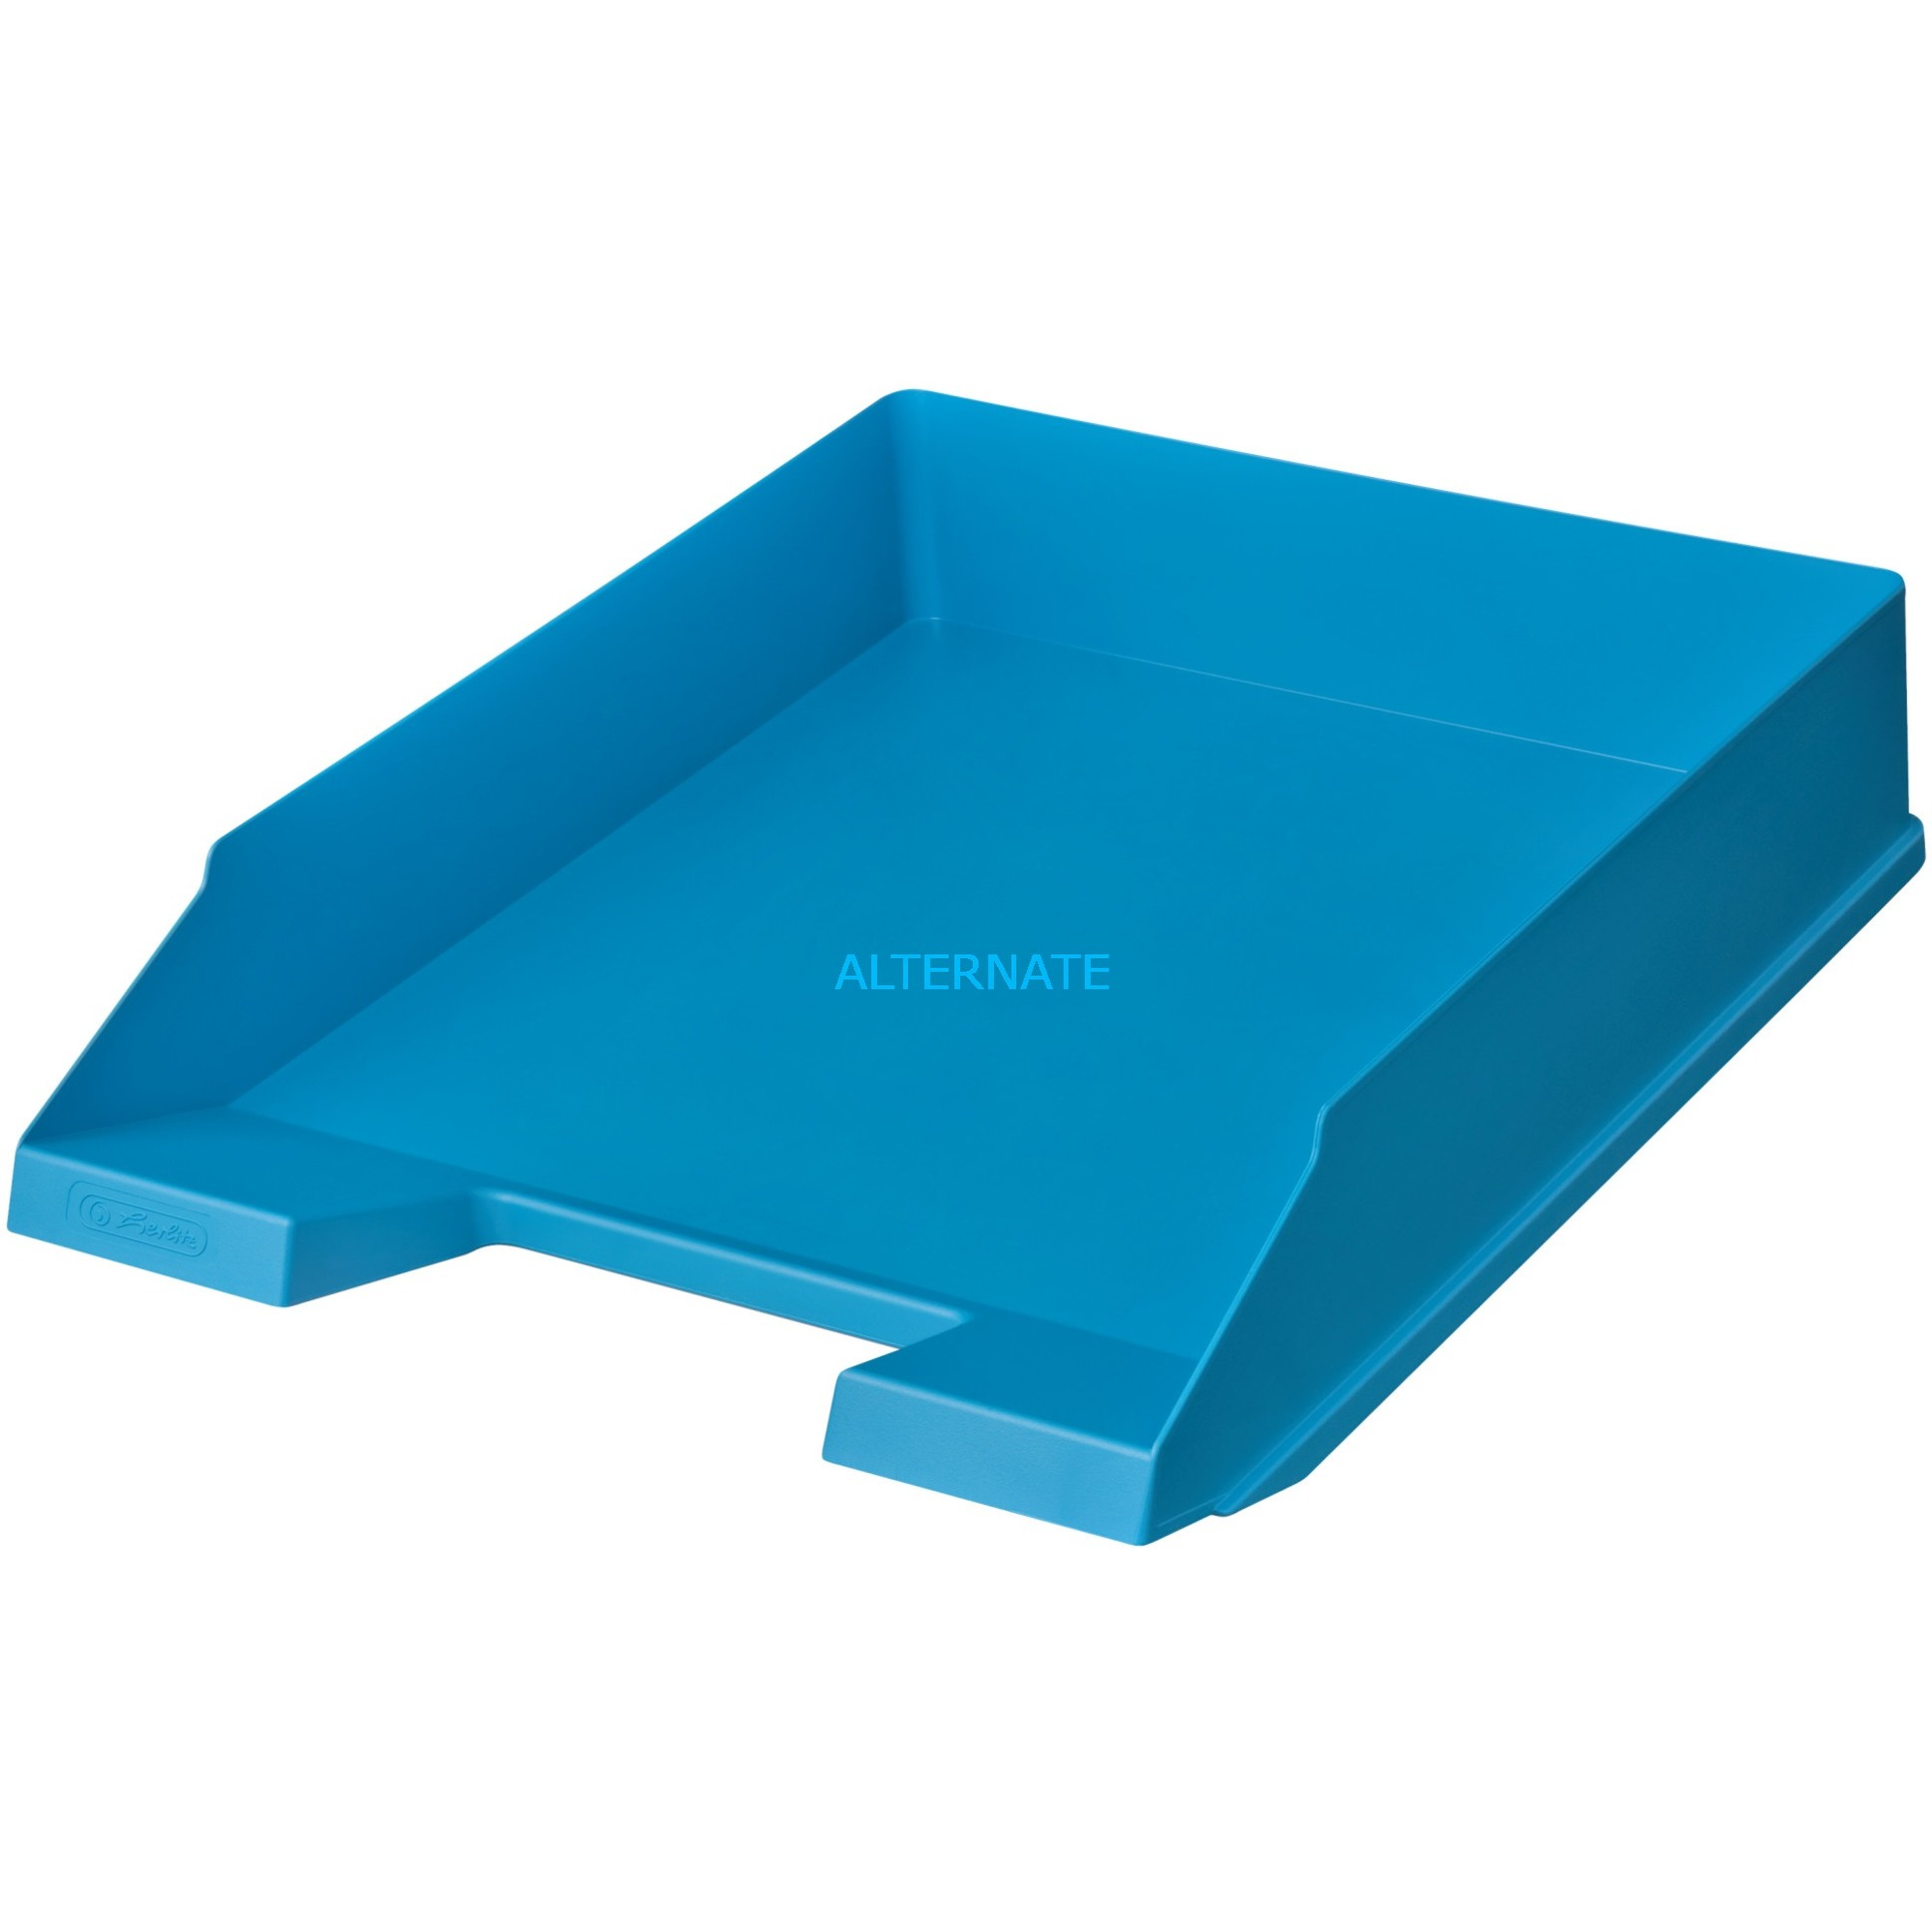 Image of Ablagekorb A4-C4 classic intensiv blau, Briefablage